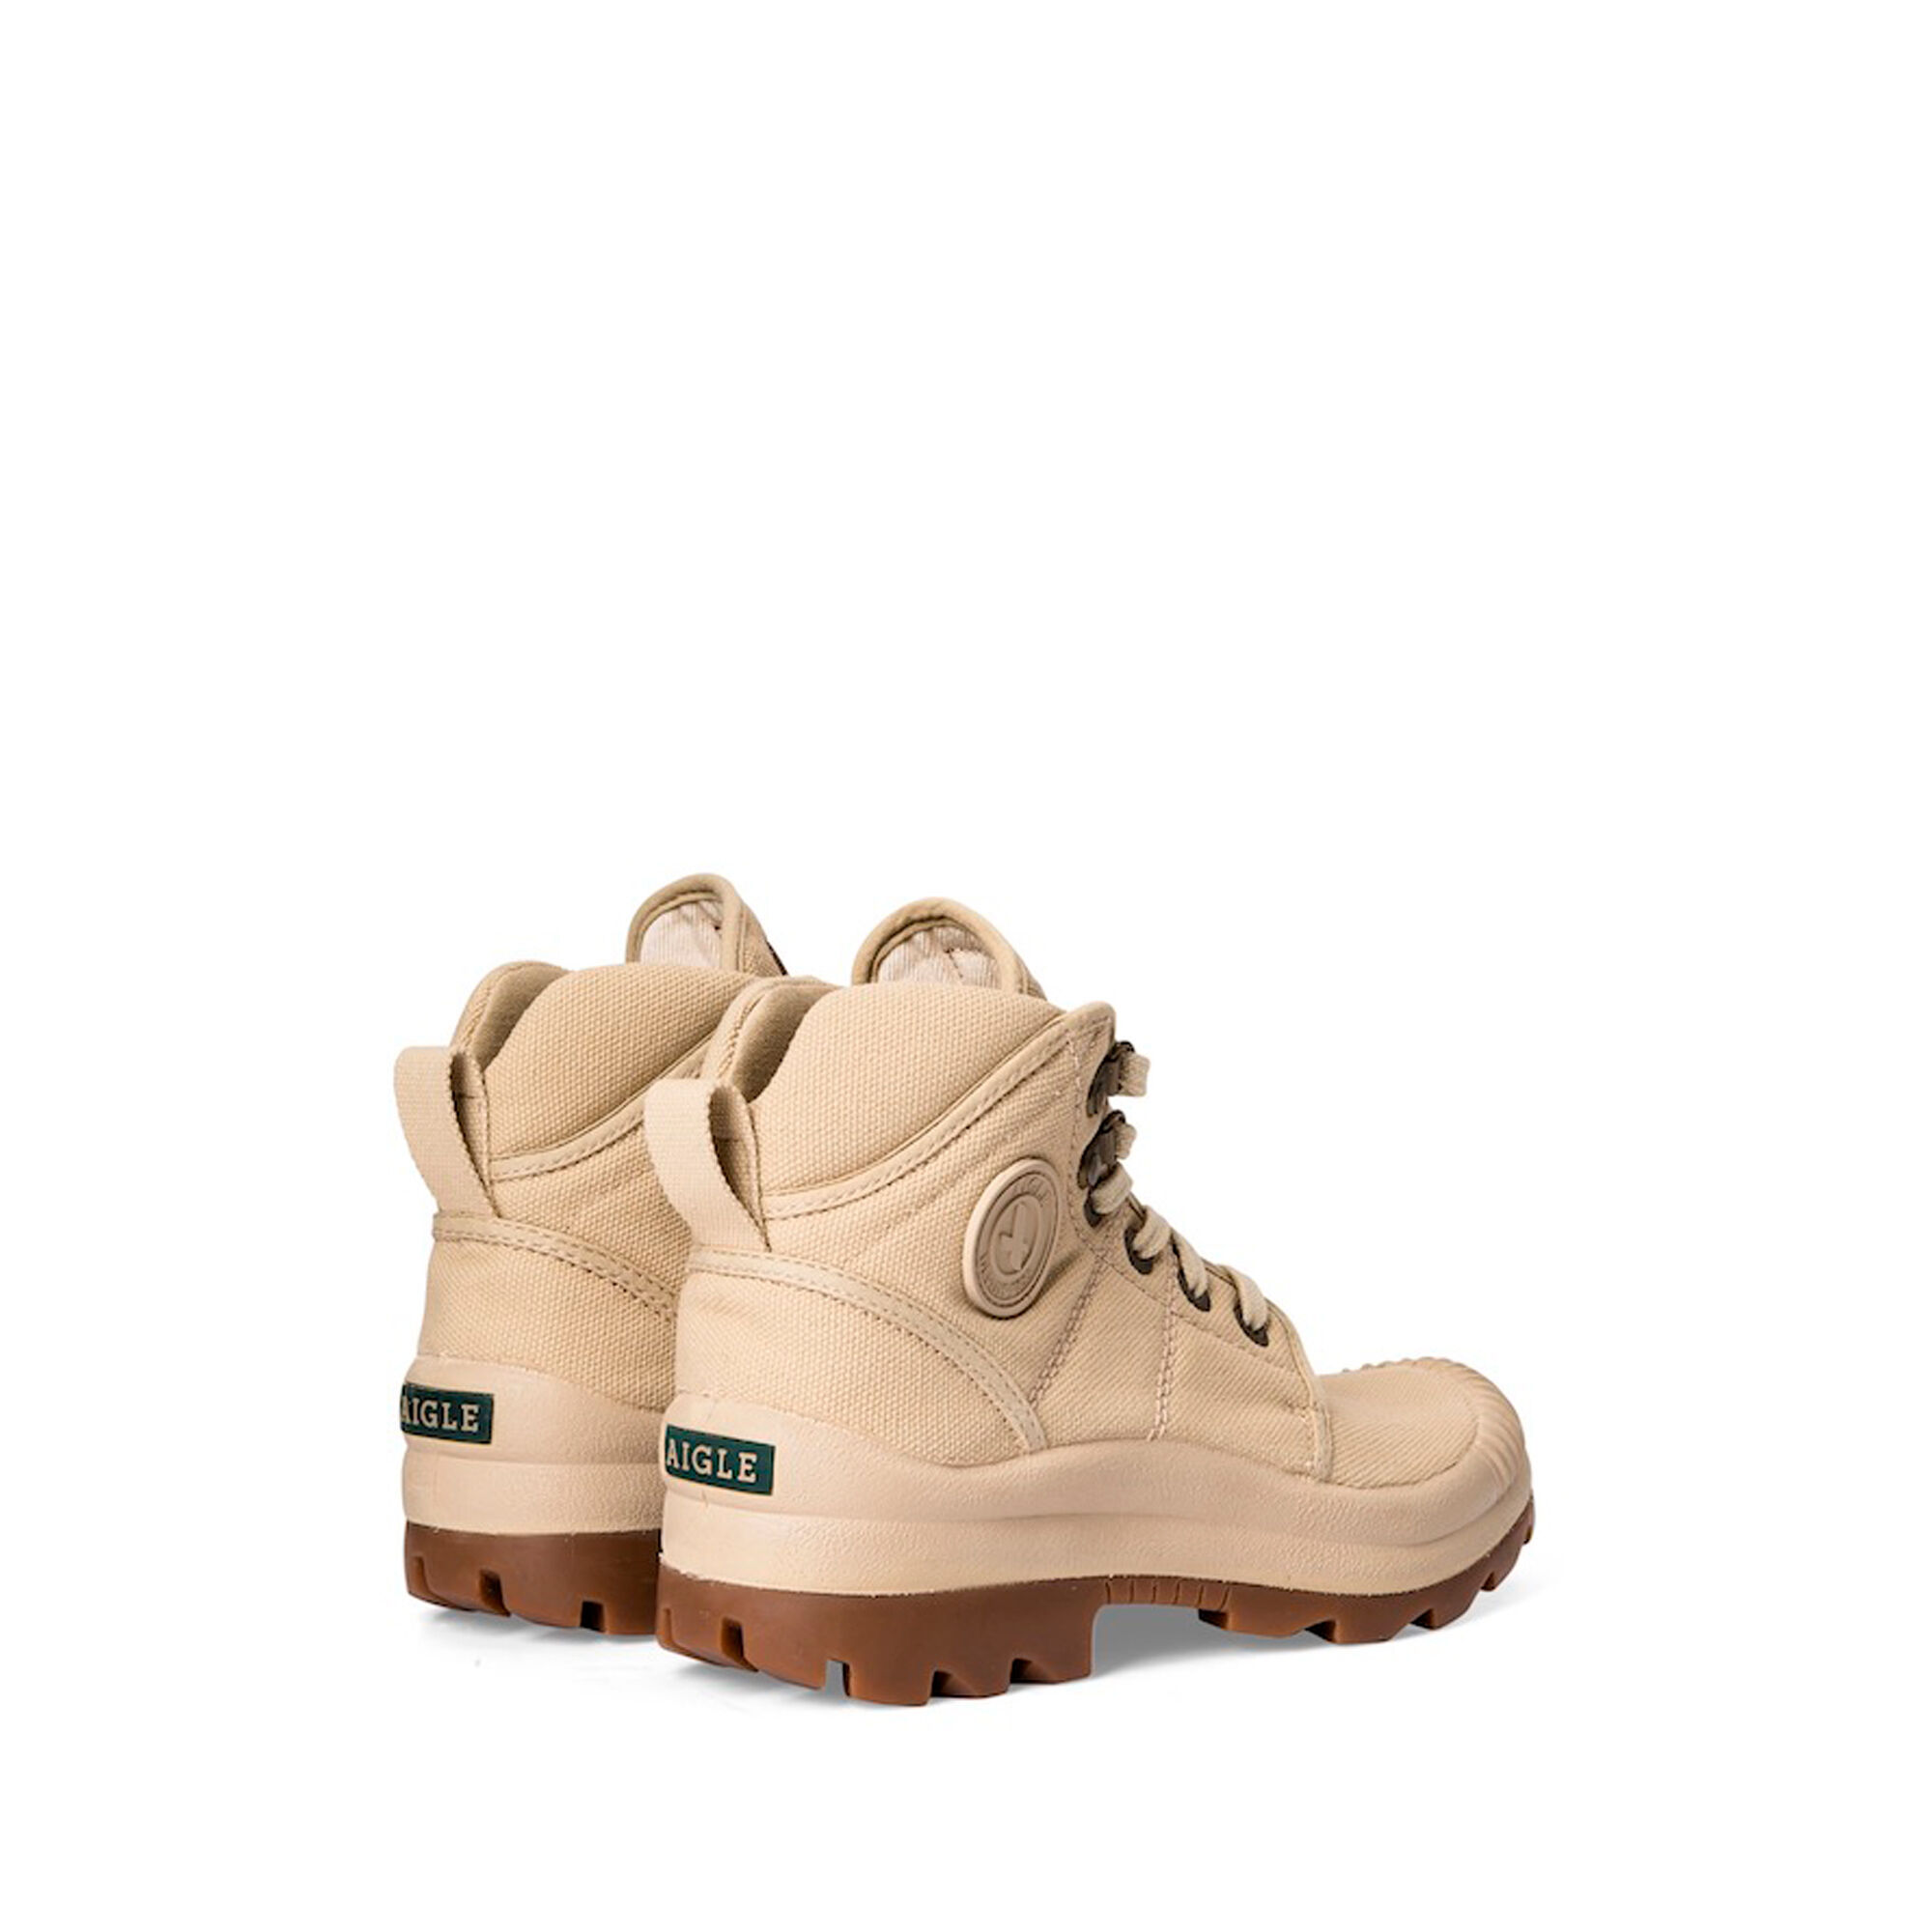 Chaussures Baroudeur Femme Du 6qvnhowfwn Toile Aigle SxIZv